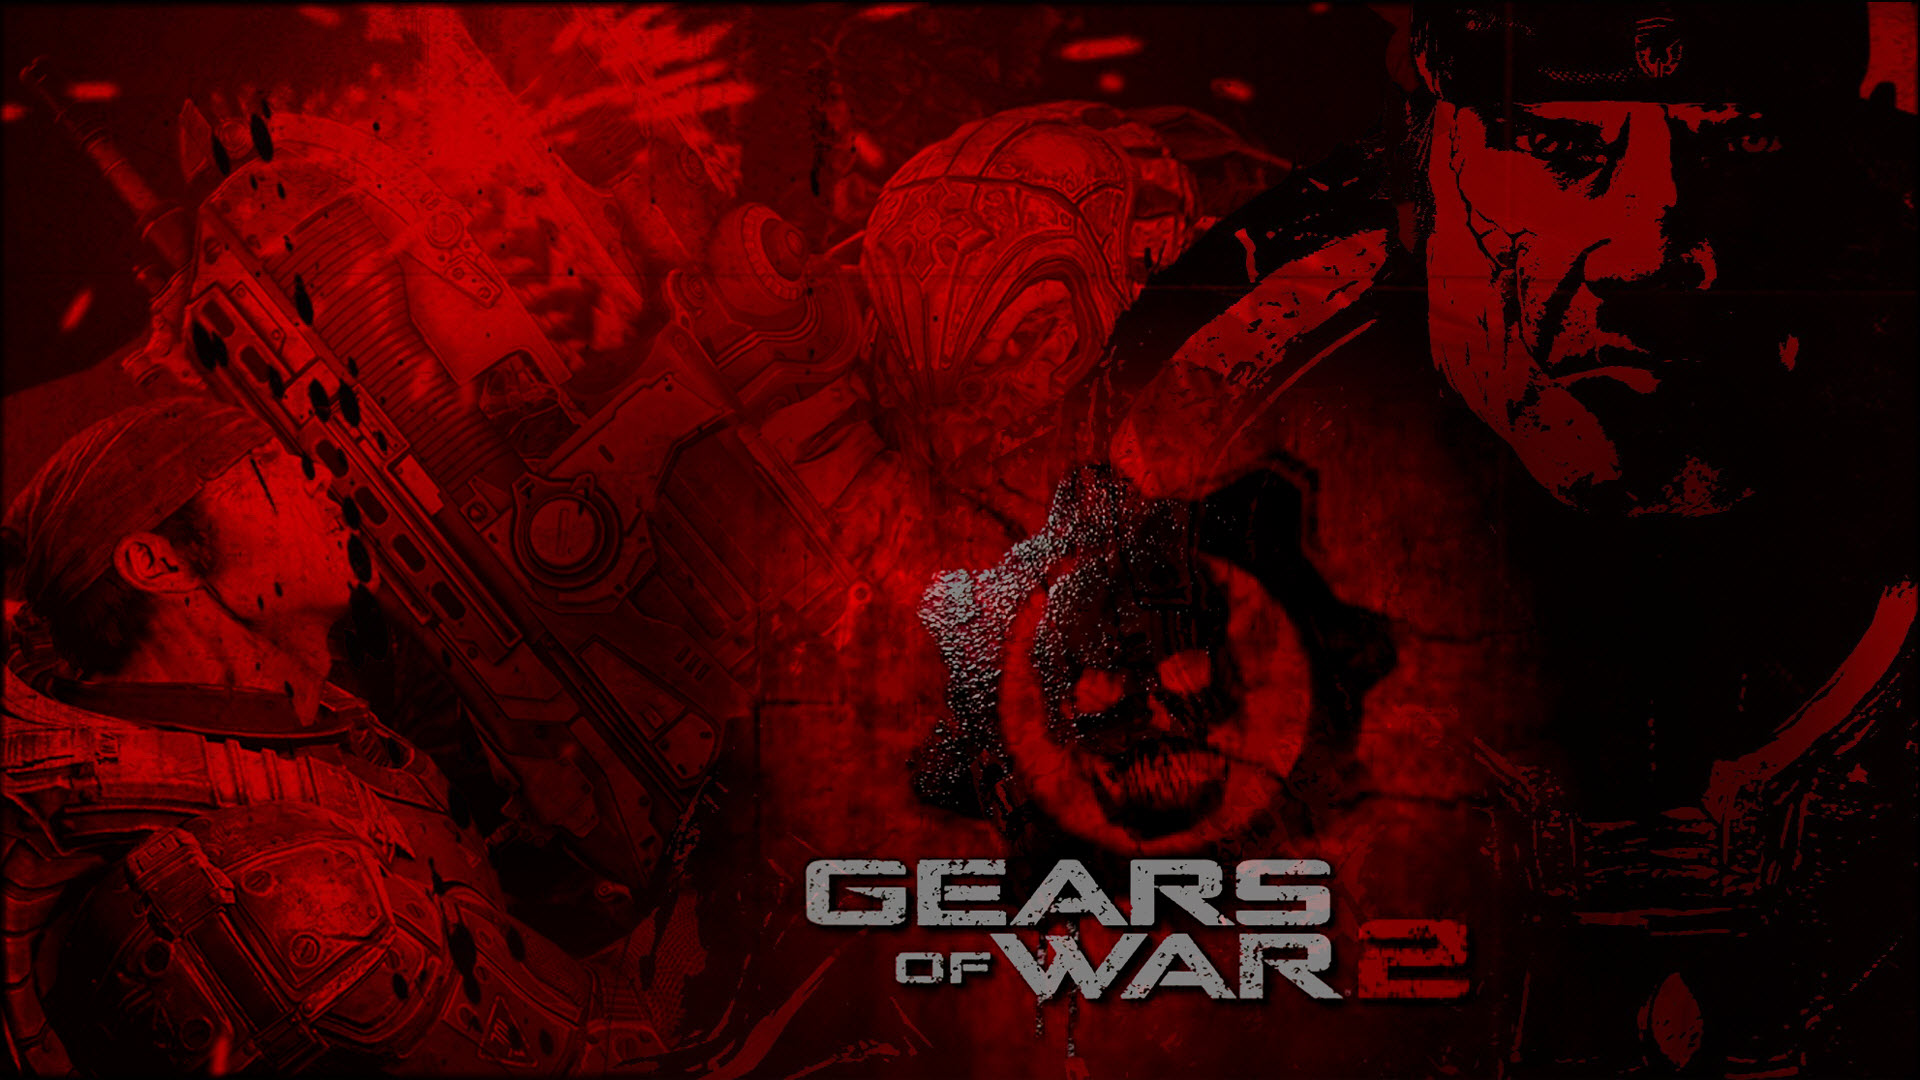 Gears of War 2 Game Wallpapers HD Wallpapers 1920x1080